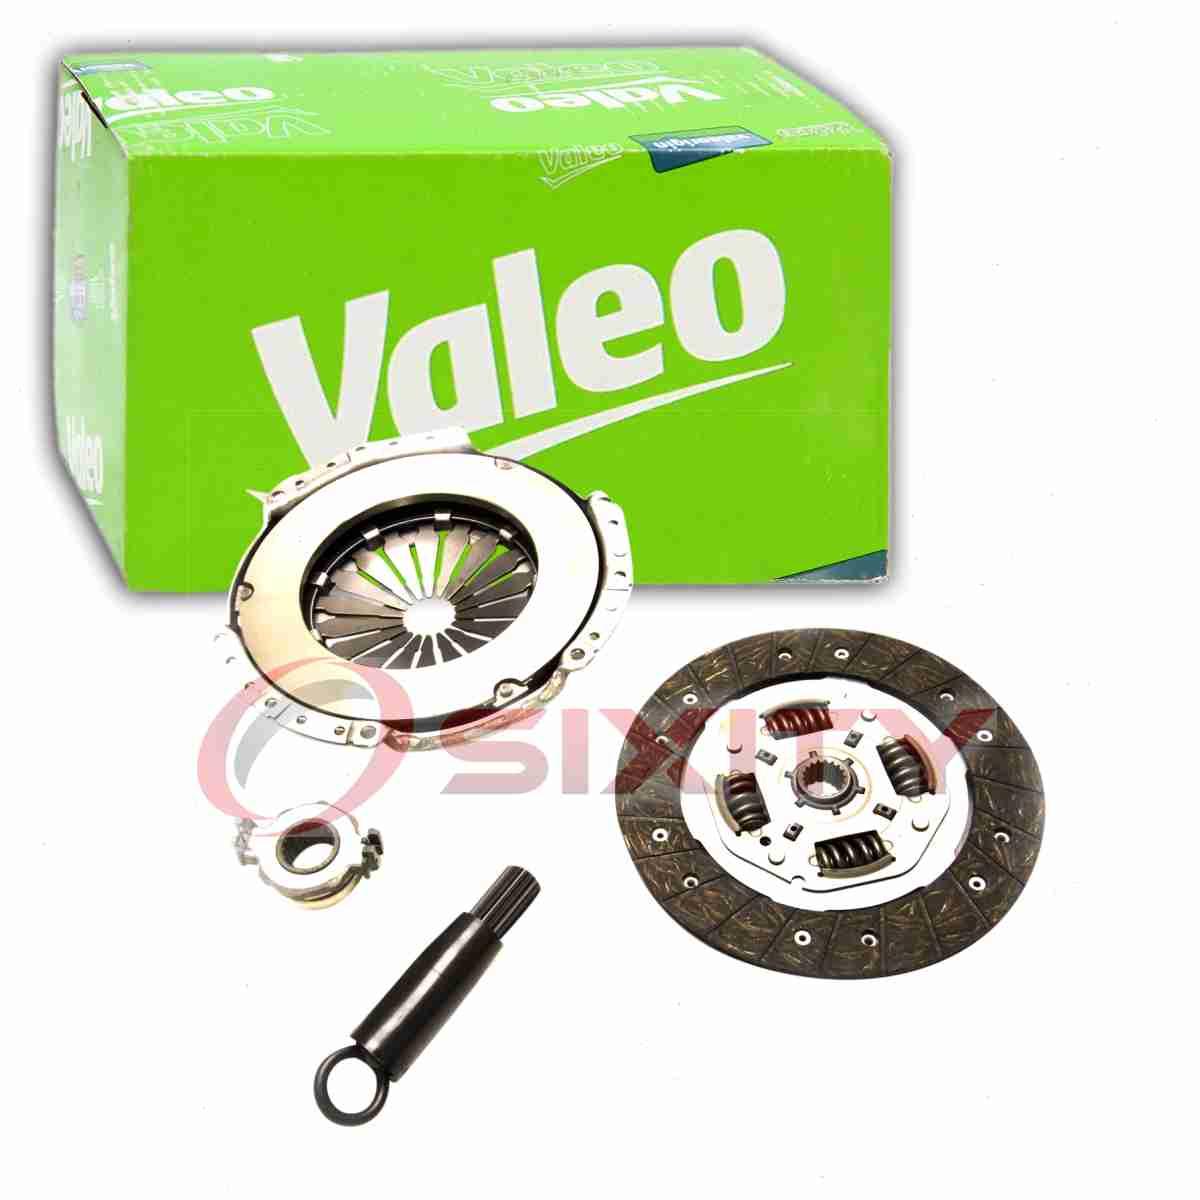 Valeo Clutch Kit For 2002-2004 Mini Cooper 1.6L L4